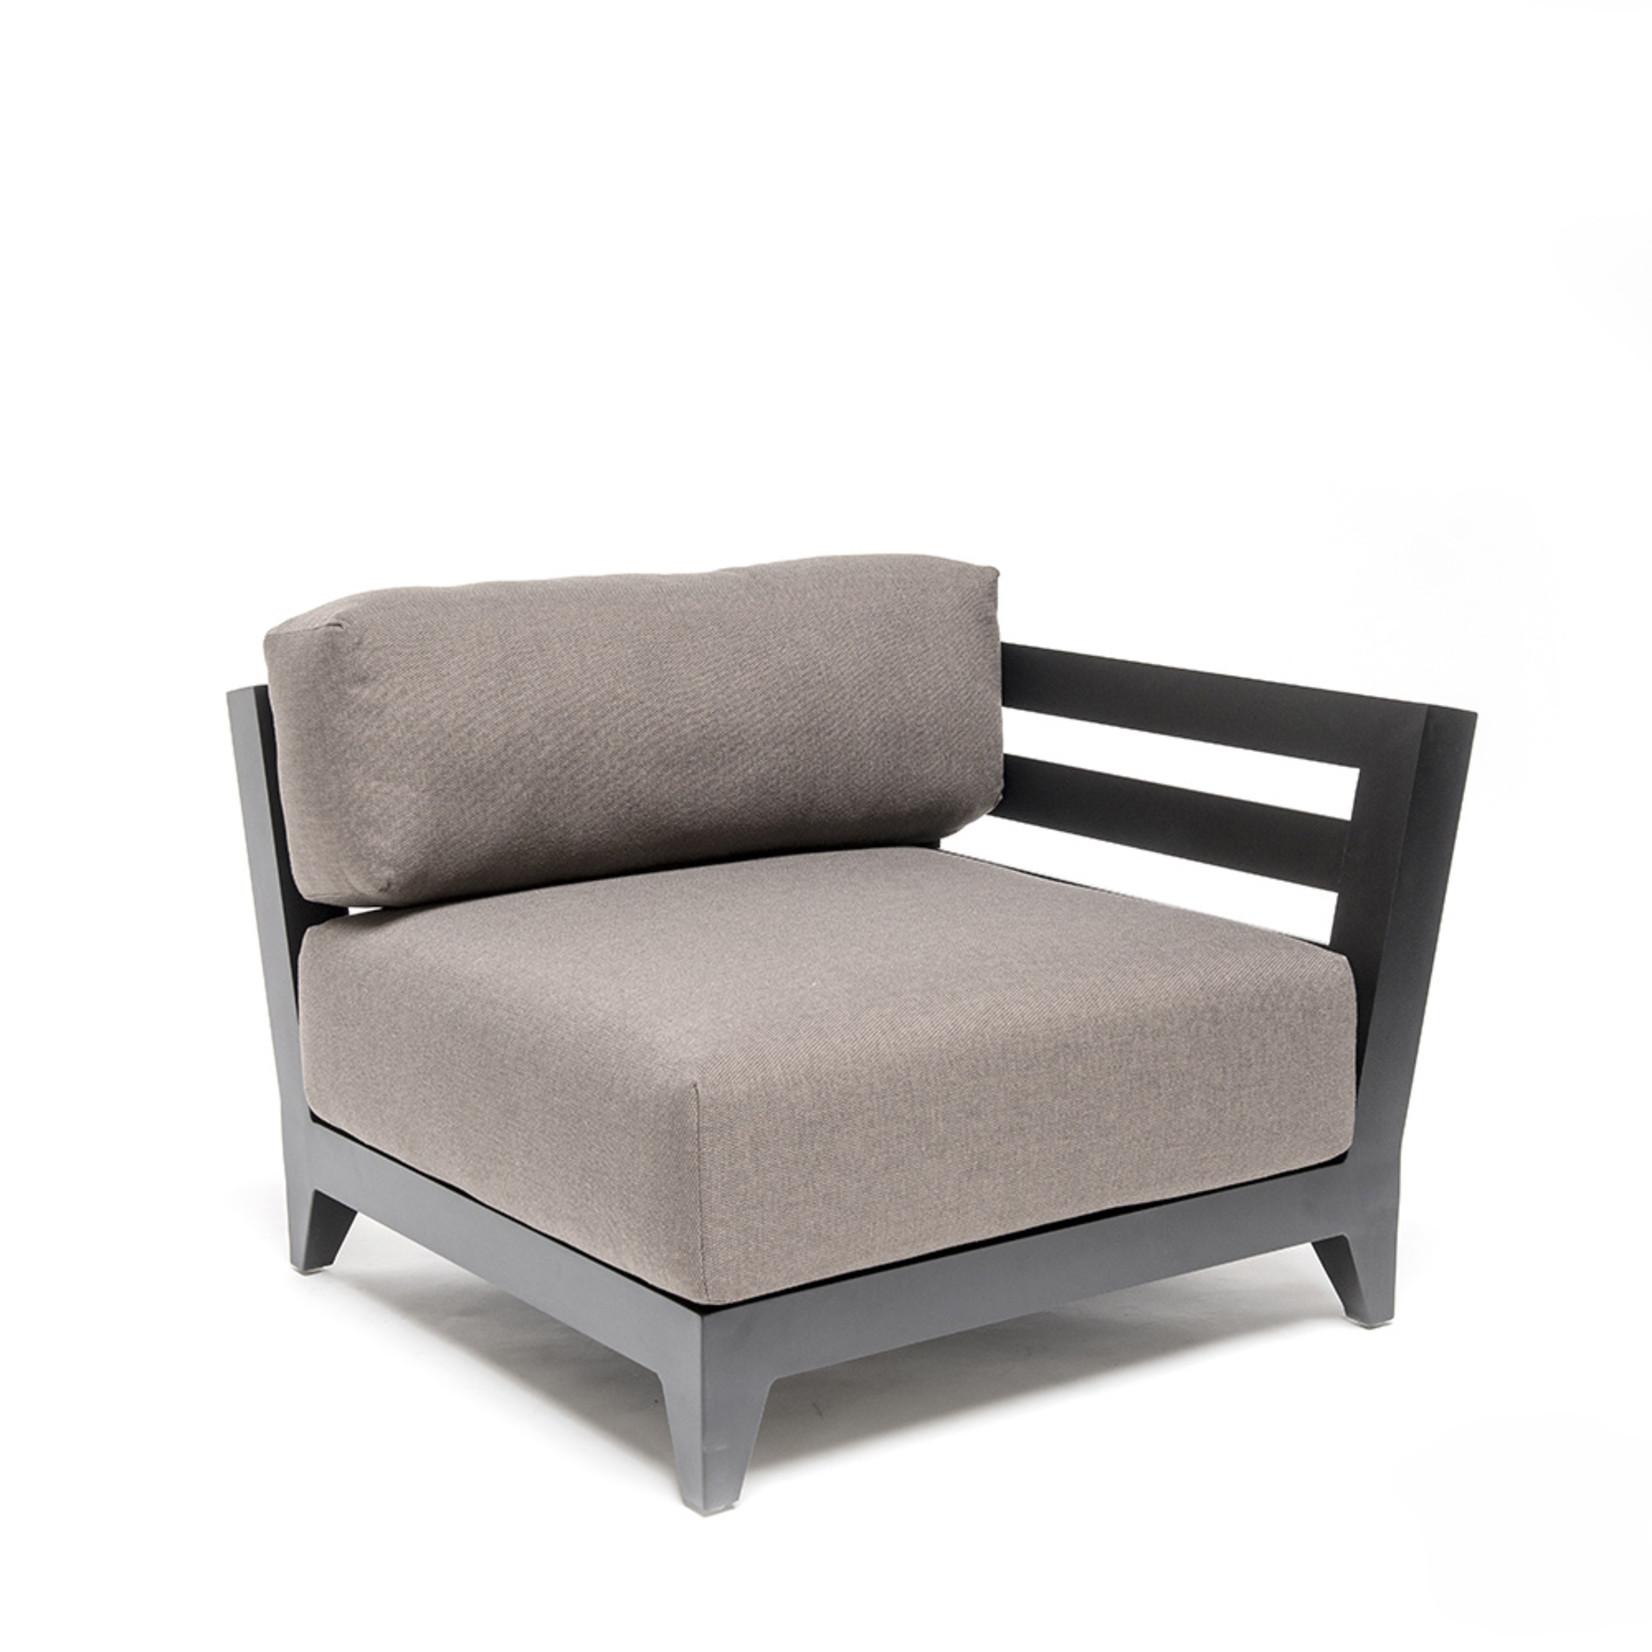 Gommaire Left Corner Mia   Aluminum Matte Black + Cushion